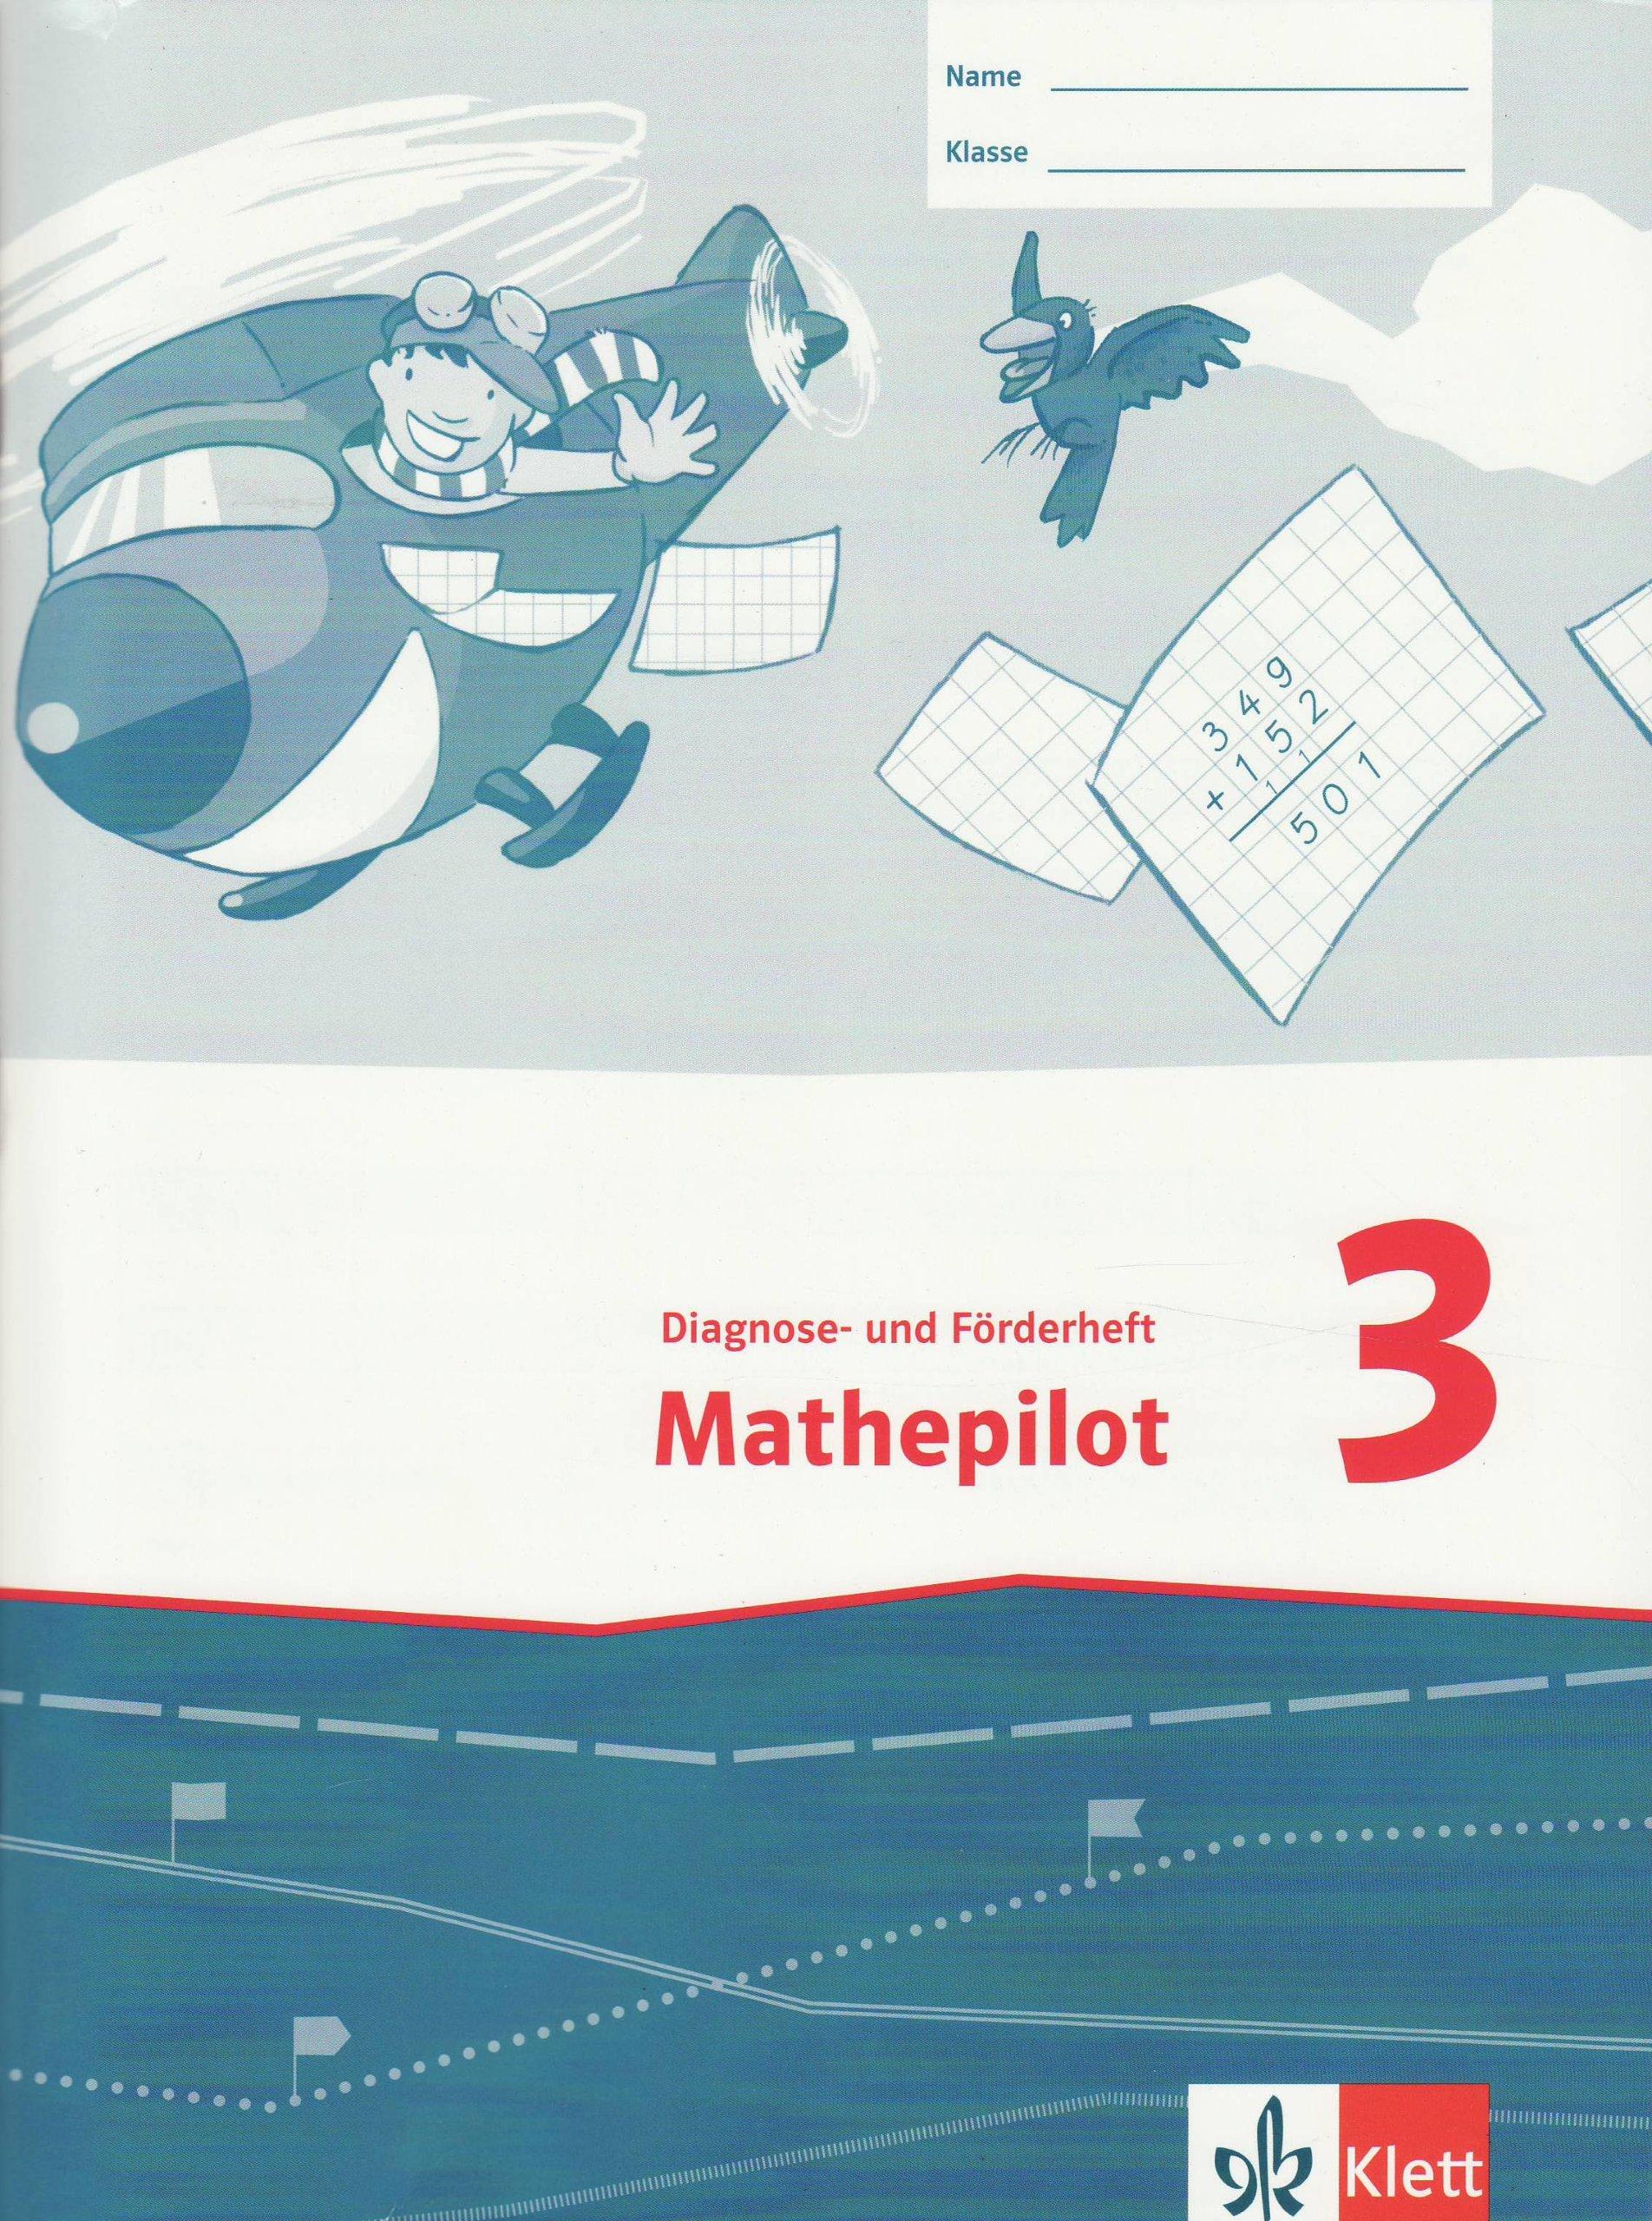 Mathepilot/Diagnose- und Förderheft 3. Schuljahr